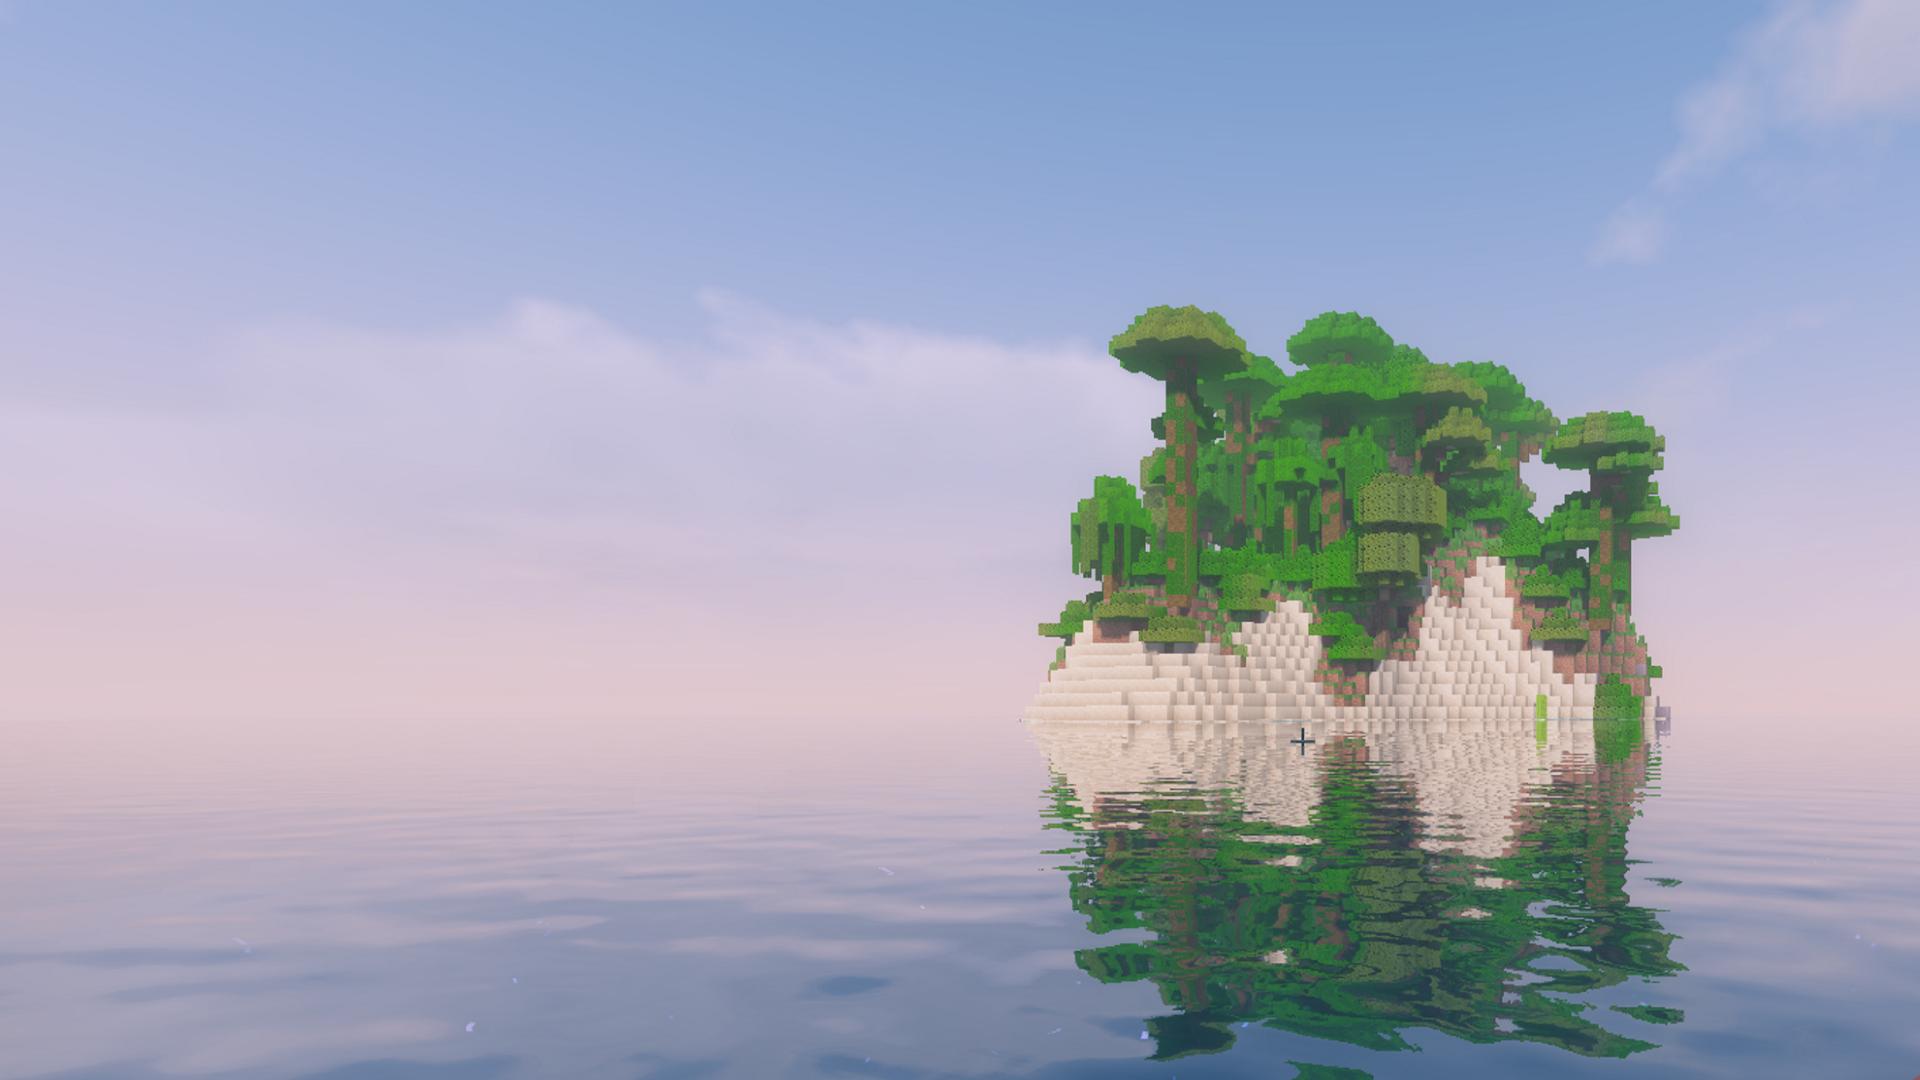 Minecraft Island [1920 x 1080] | Wallpaper | R wallpaper ... - Fond D'ecran Minecraft